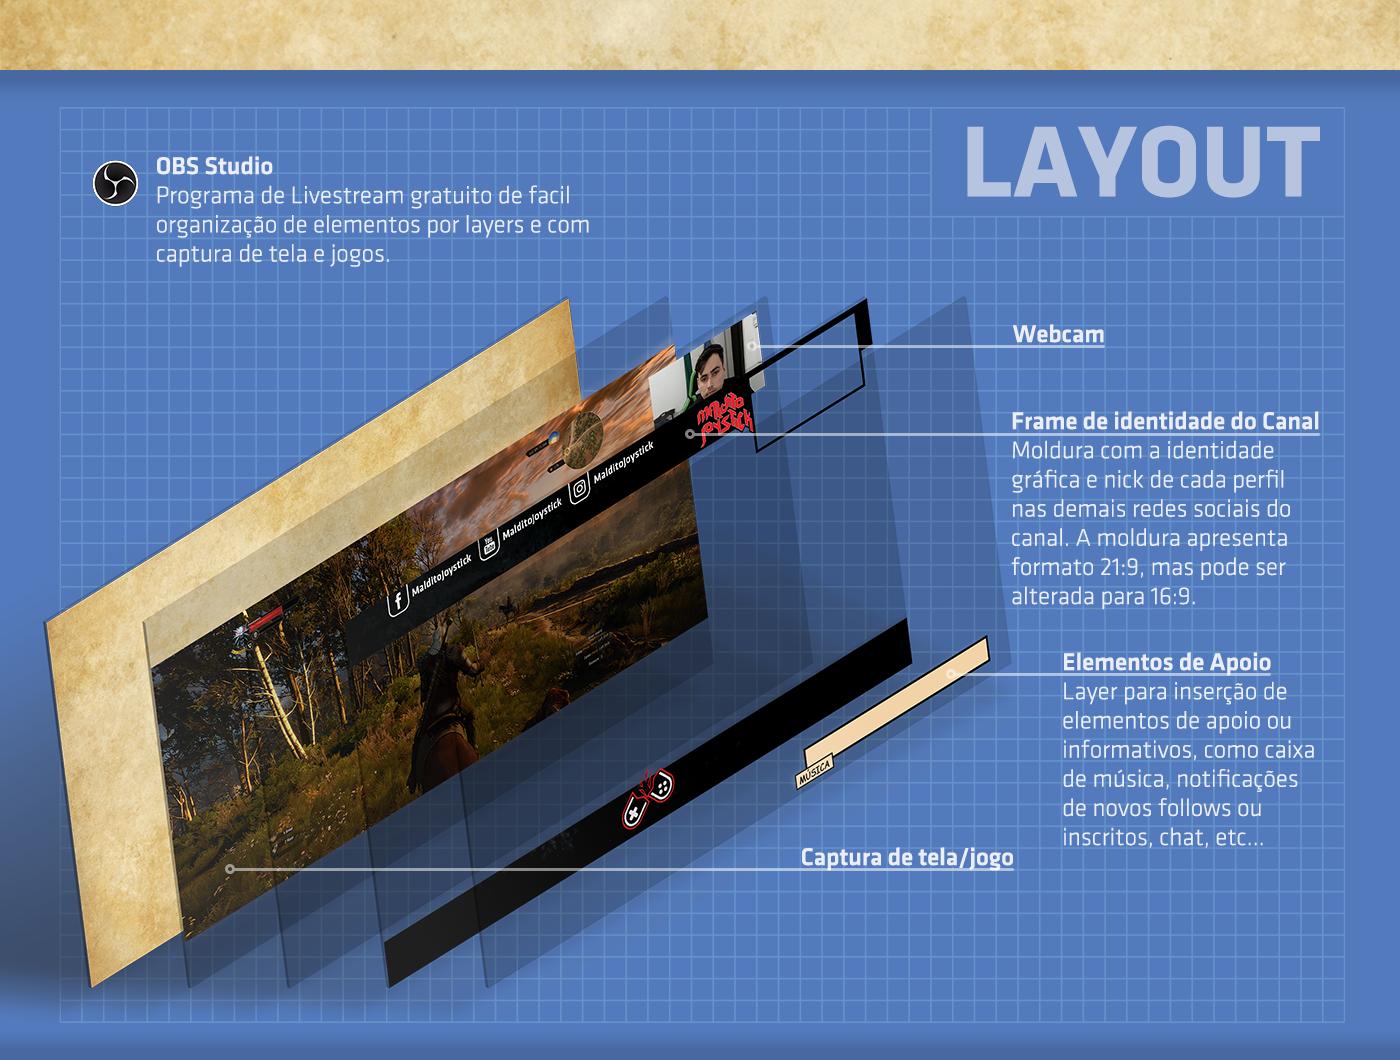 brand Layout Interface motion gameplay livestream Games video vfx